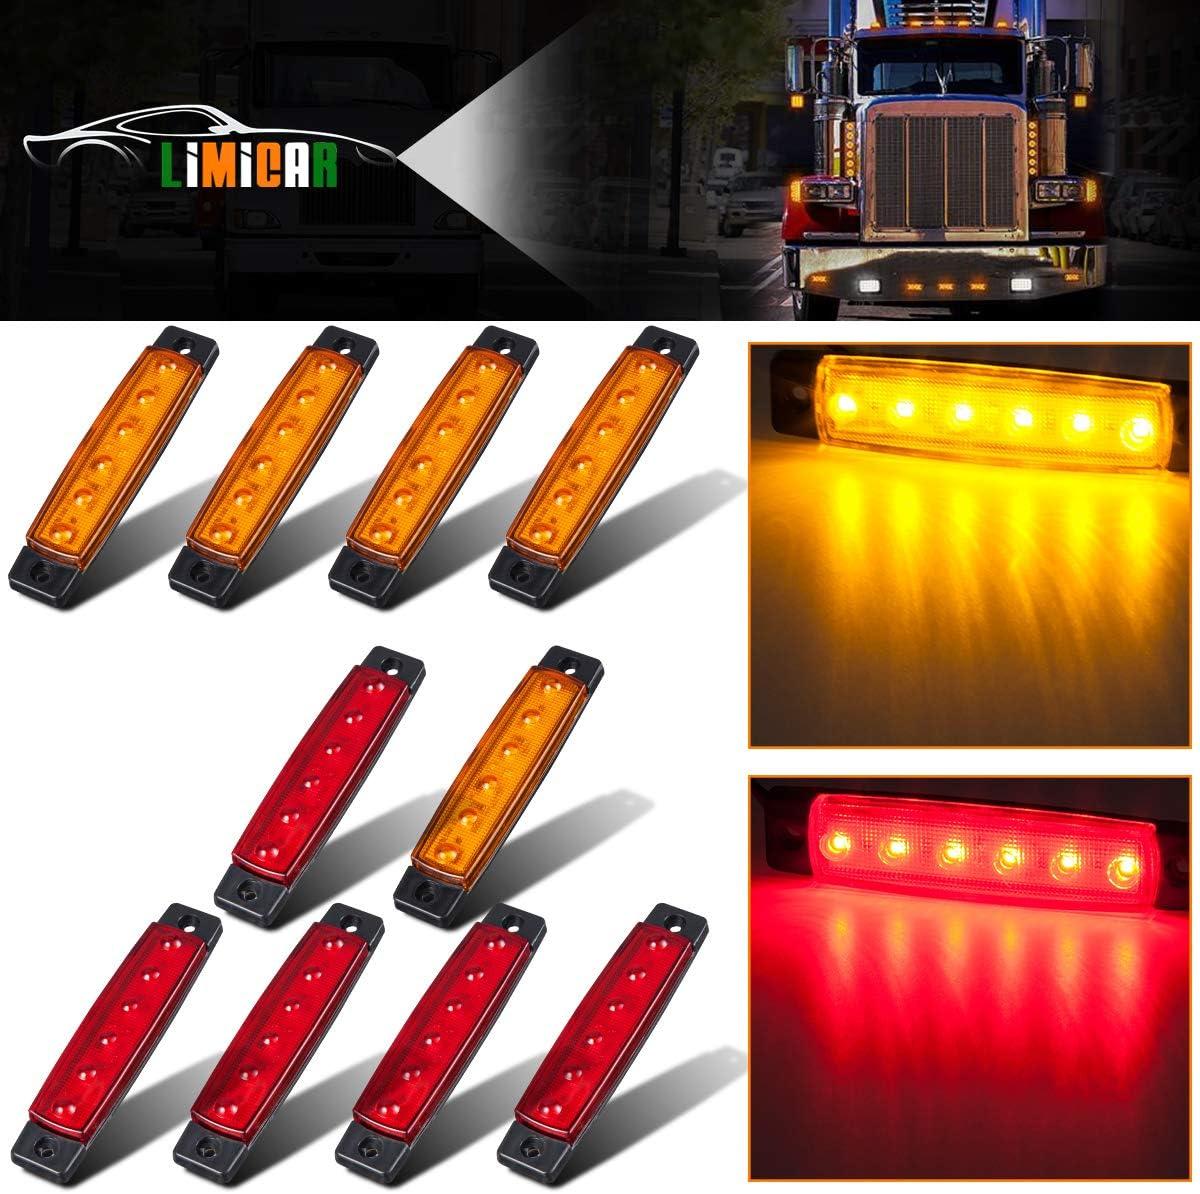 10X 6LED Amber Front Side Marker Light Indicator Lamp Car Truck Trailer Orange